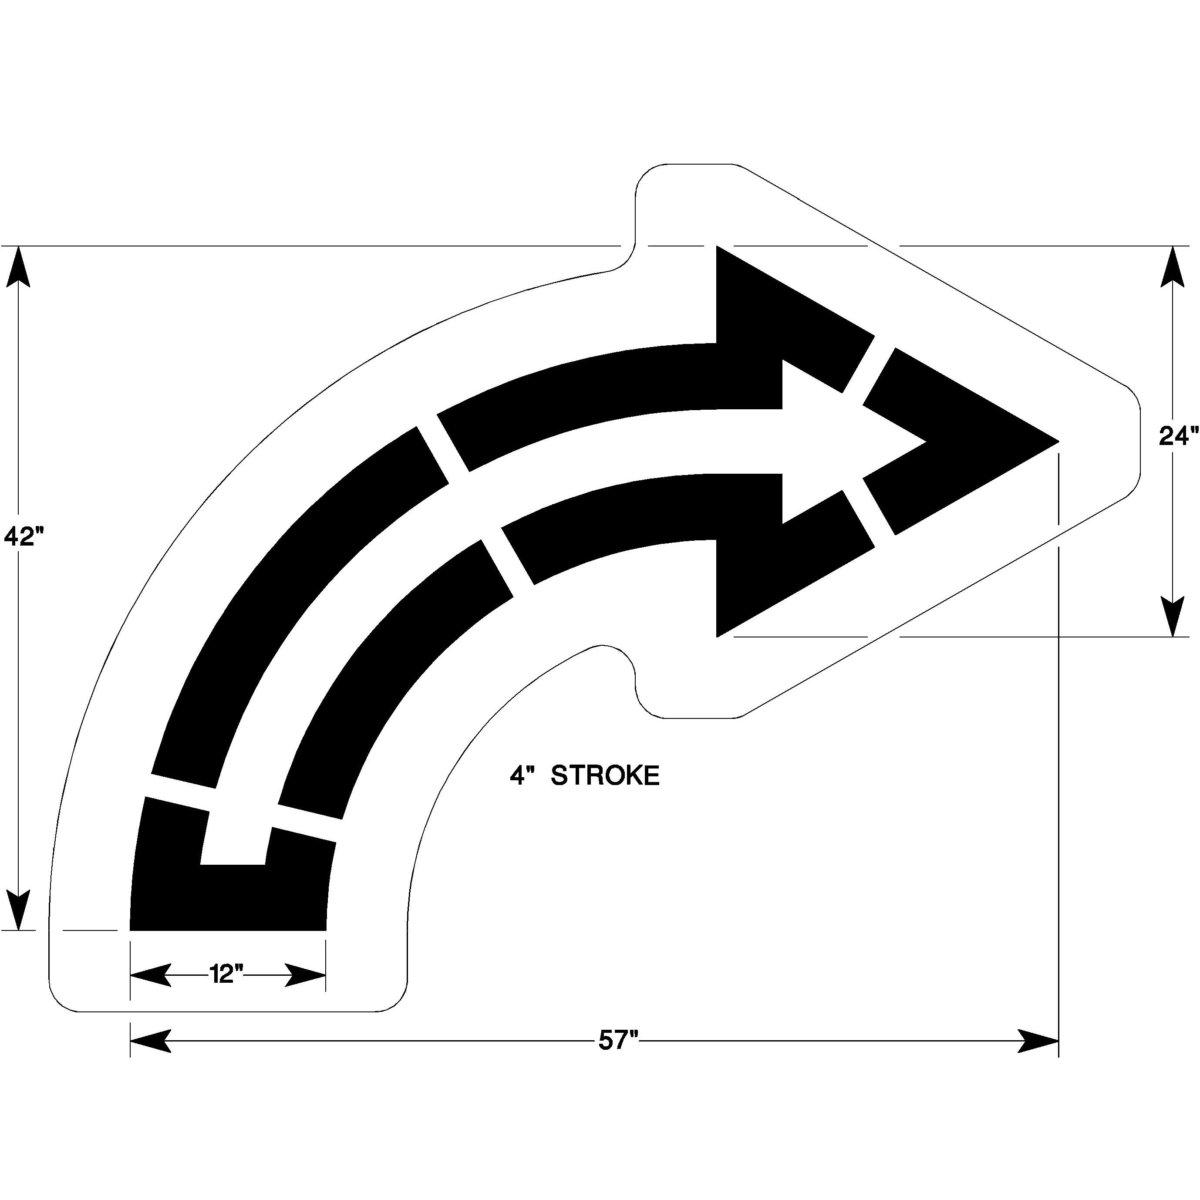 walmart curve arrow stencil. Black Bedroom Furniture Sets. Home Design Ideas